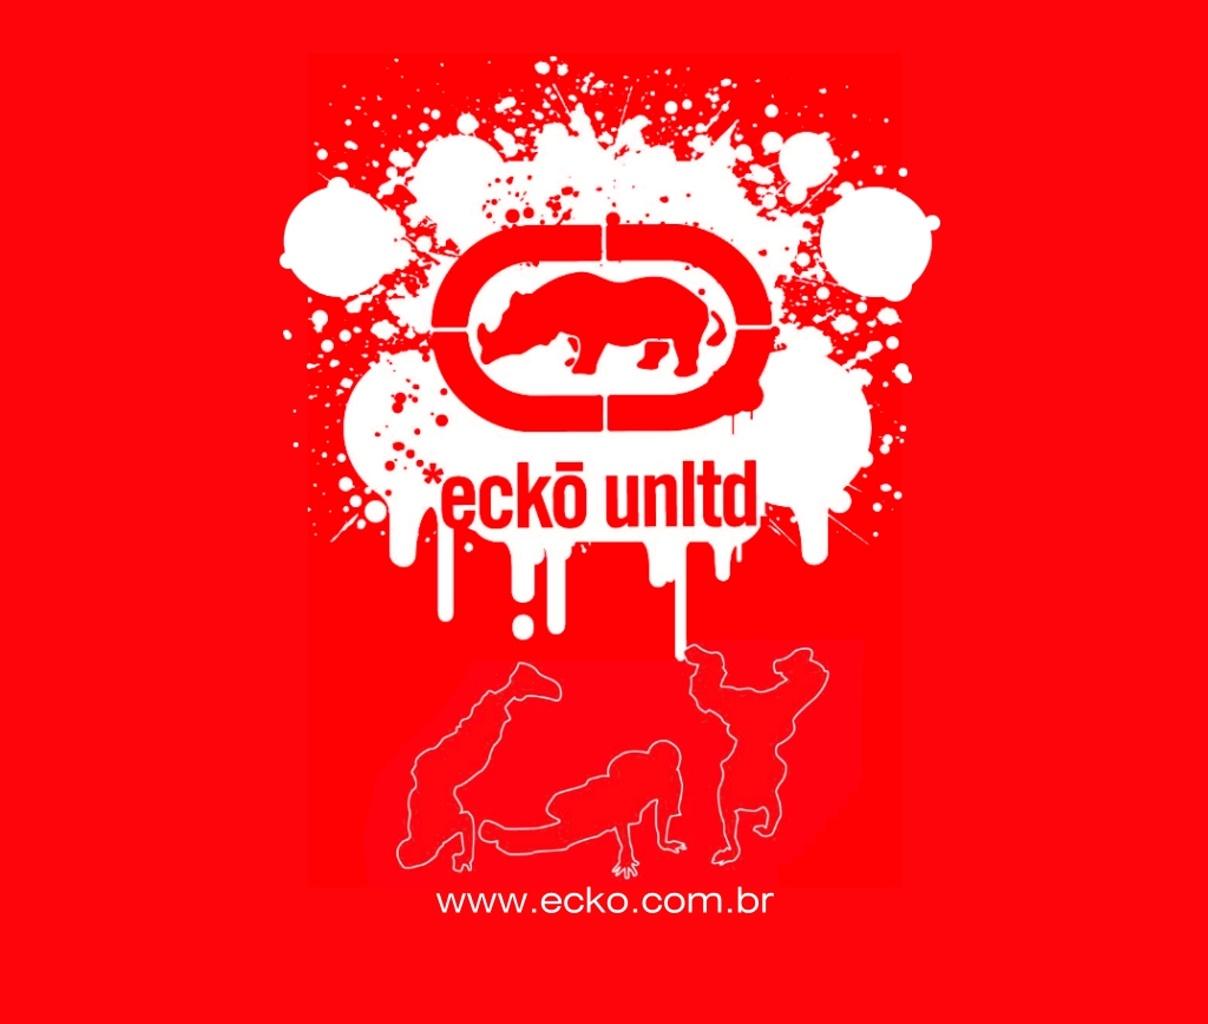 You are viewing the Fashion wallpaper named Ecko Break Dancing 1208x1024